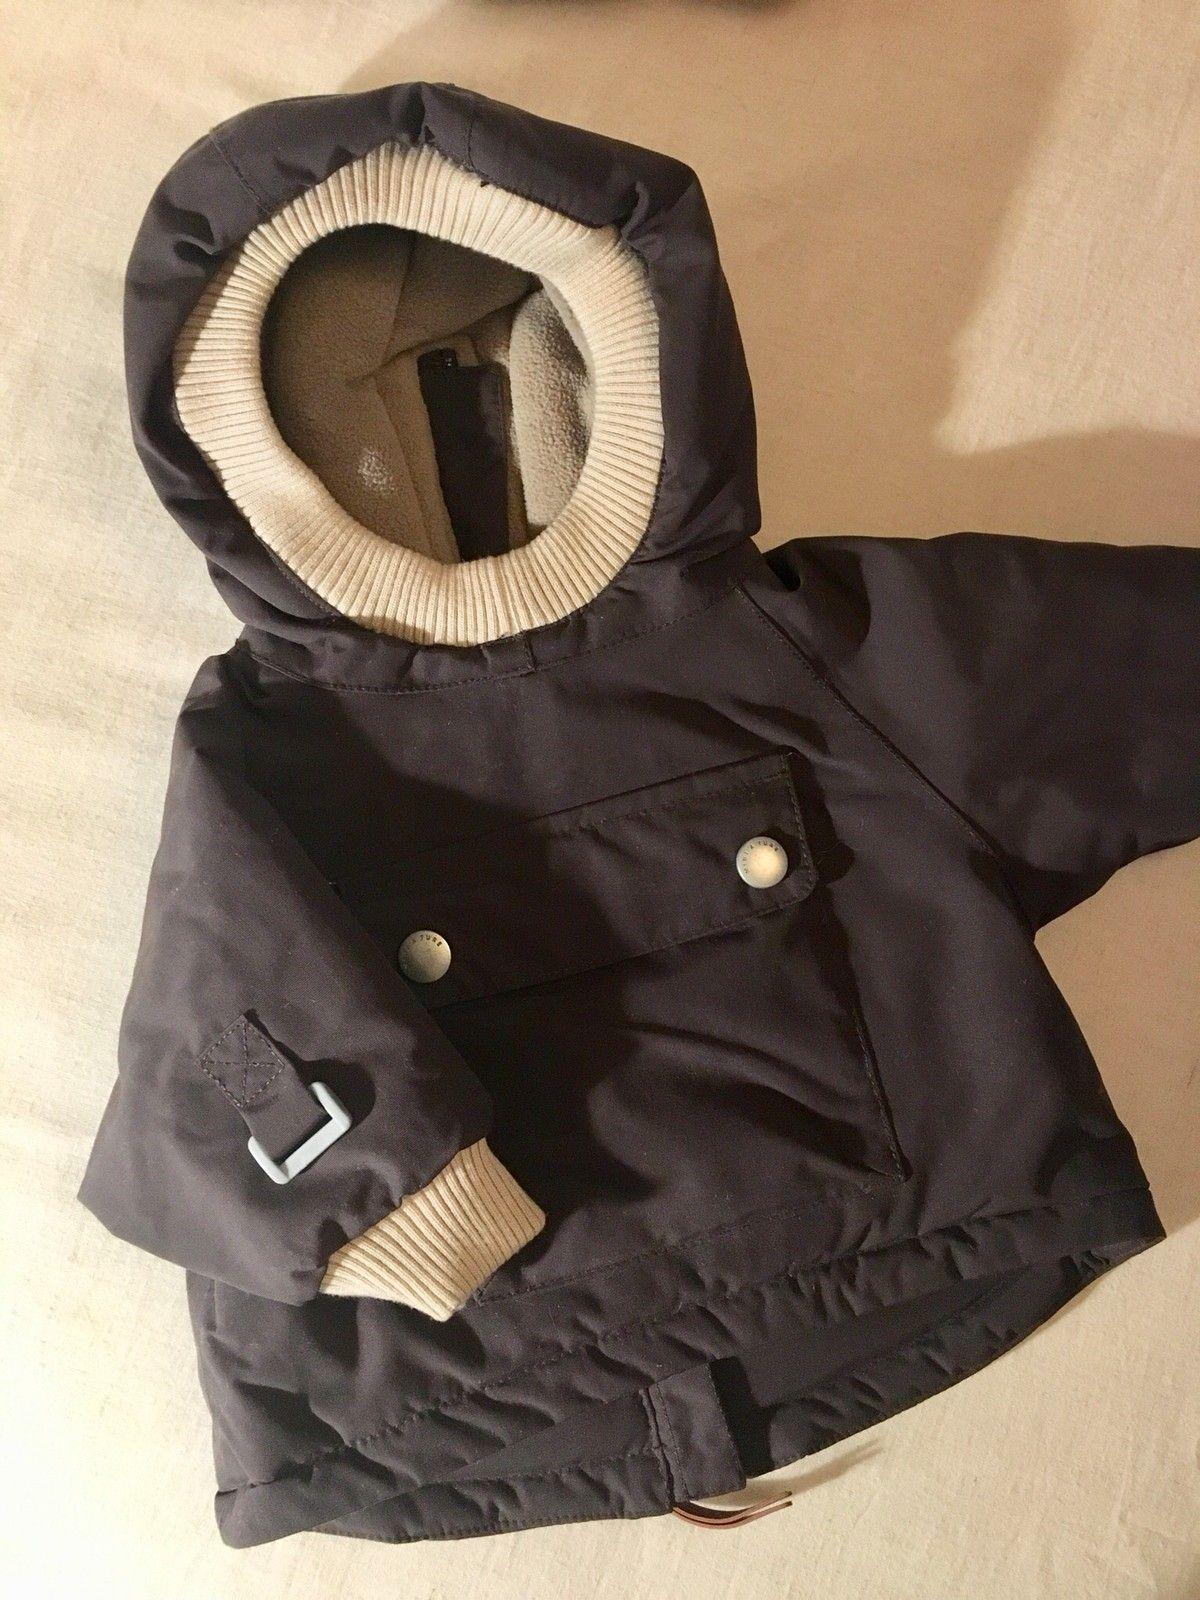 Mini a ture vinter jakke gutt 6 år. | FINN.no